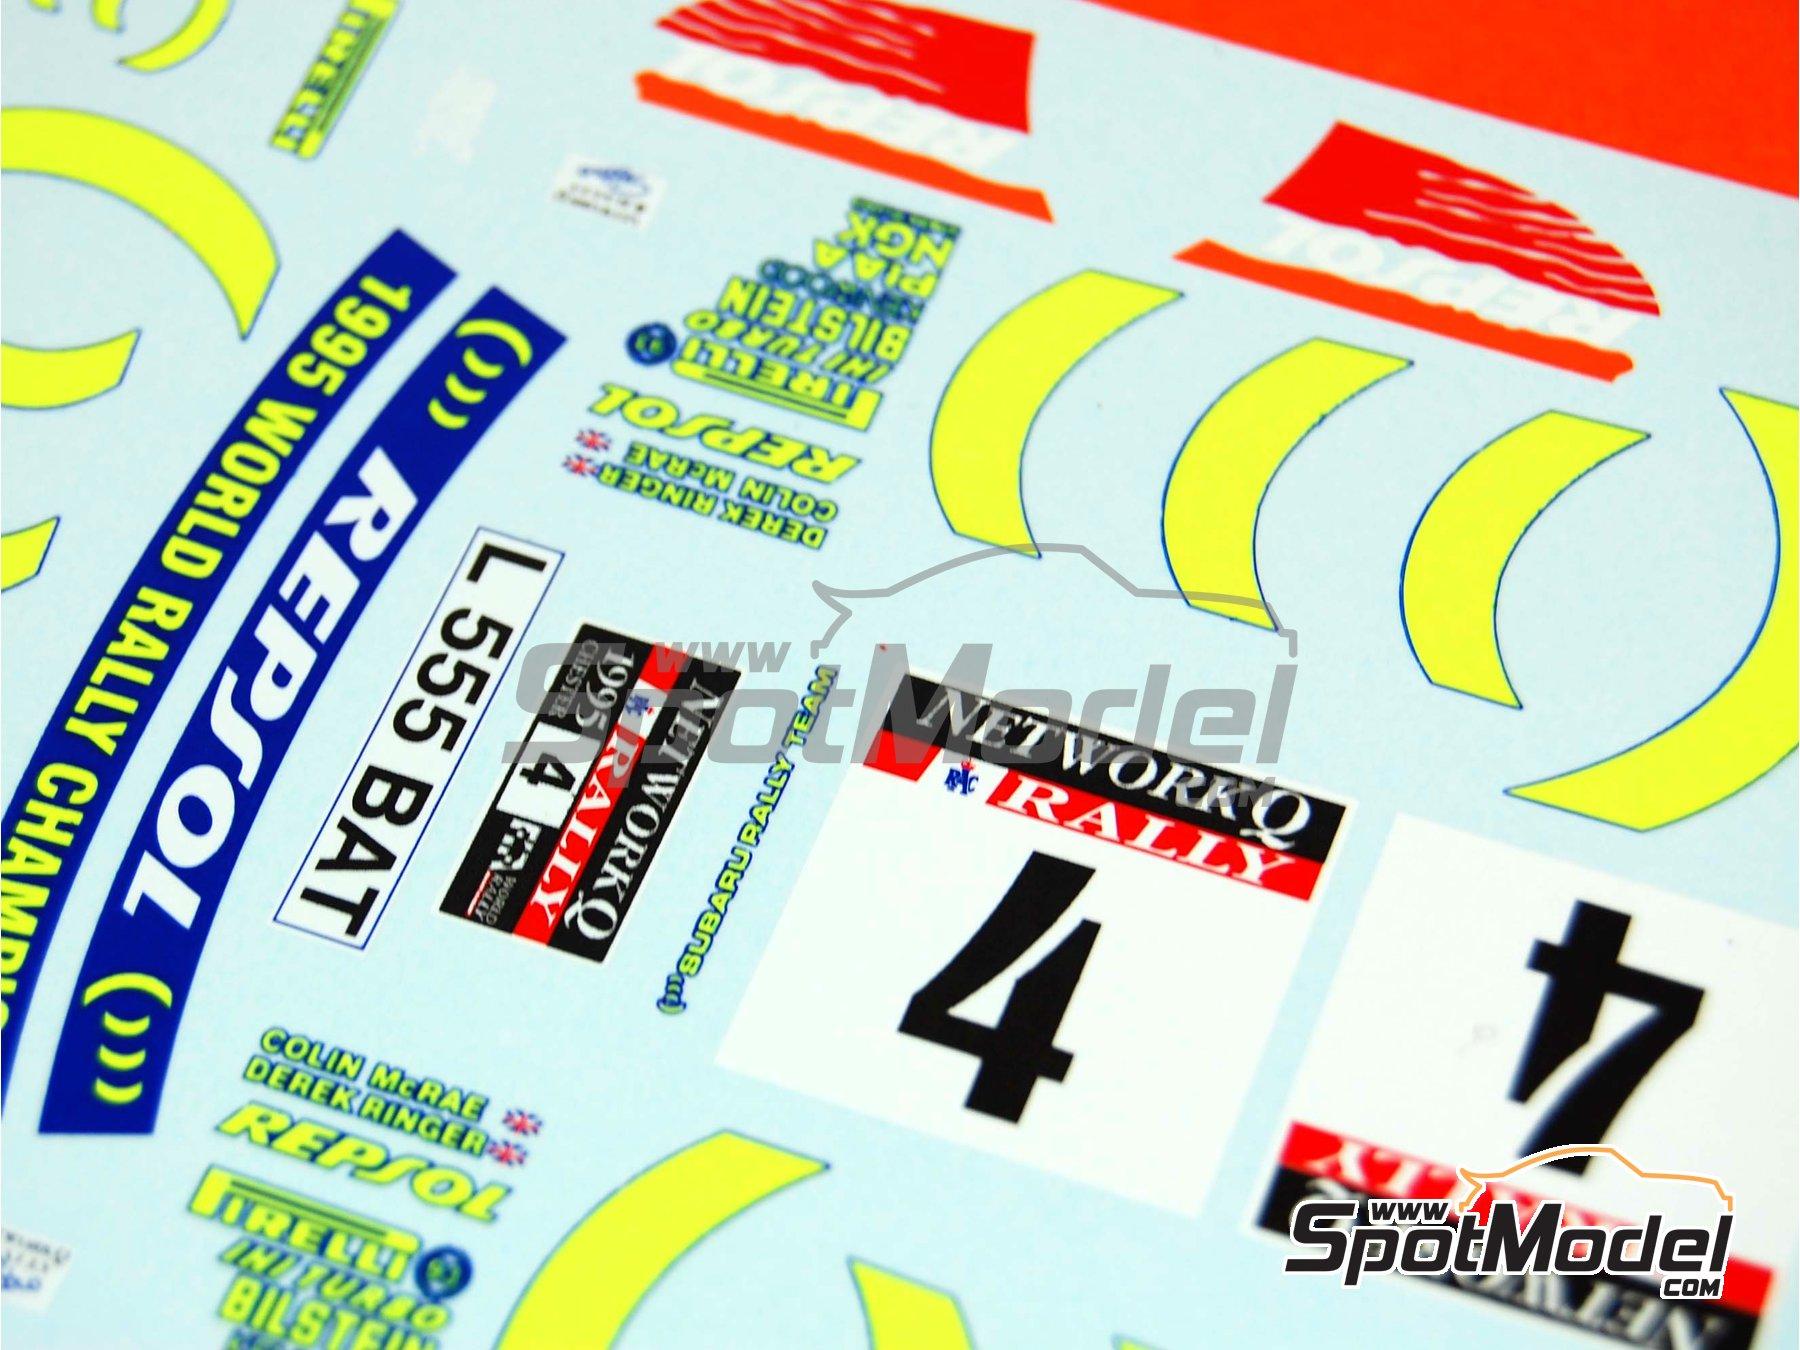 Image 10: Subaru Impreza 555 Group A - Catalunya Costa Dorada RACC Rally, RAC Rally 1995 | Marking / livery in 1/24 scale manufactured by Renaissance Models (ref.TK24-289)